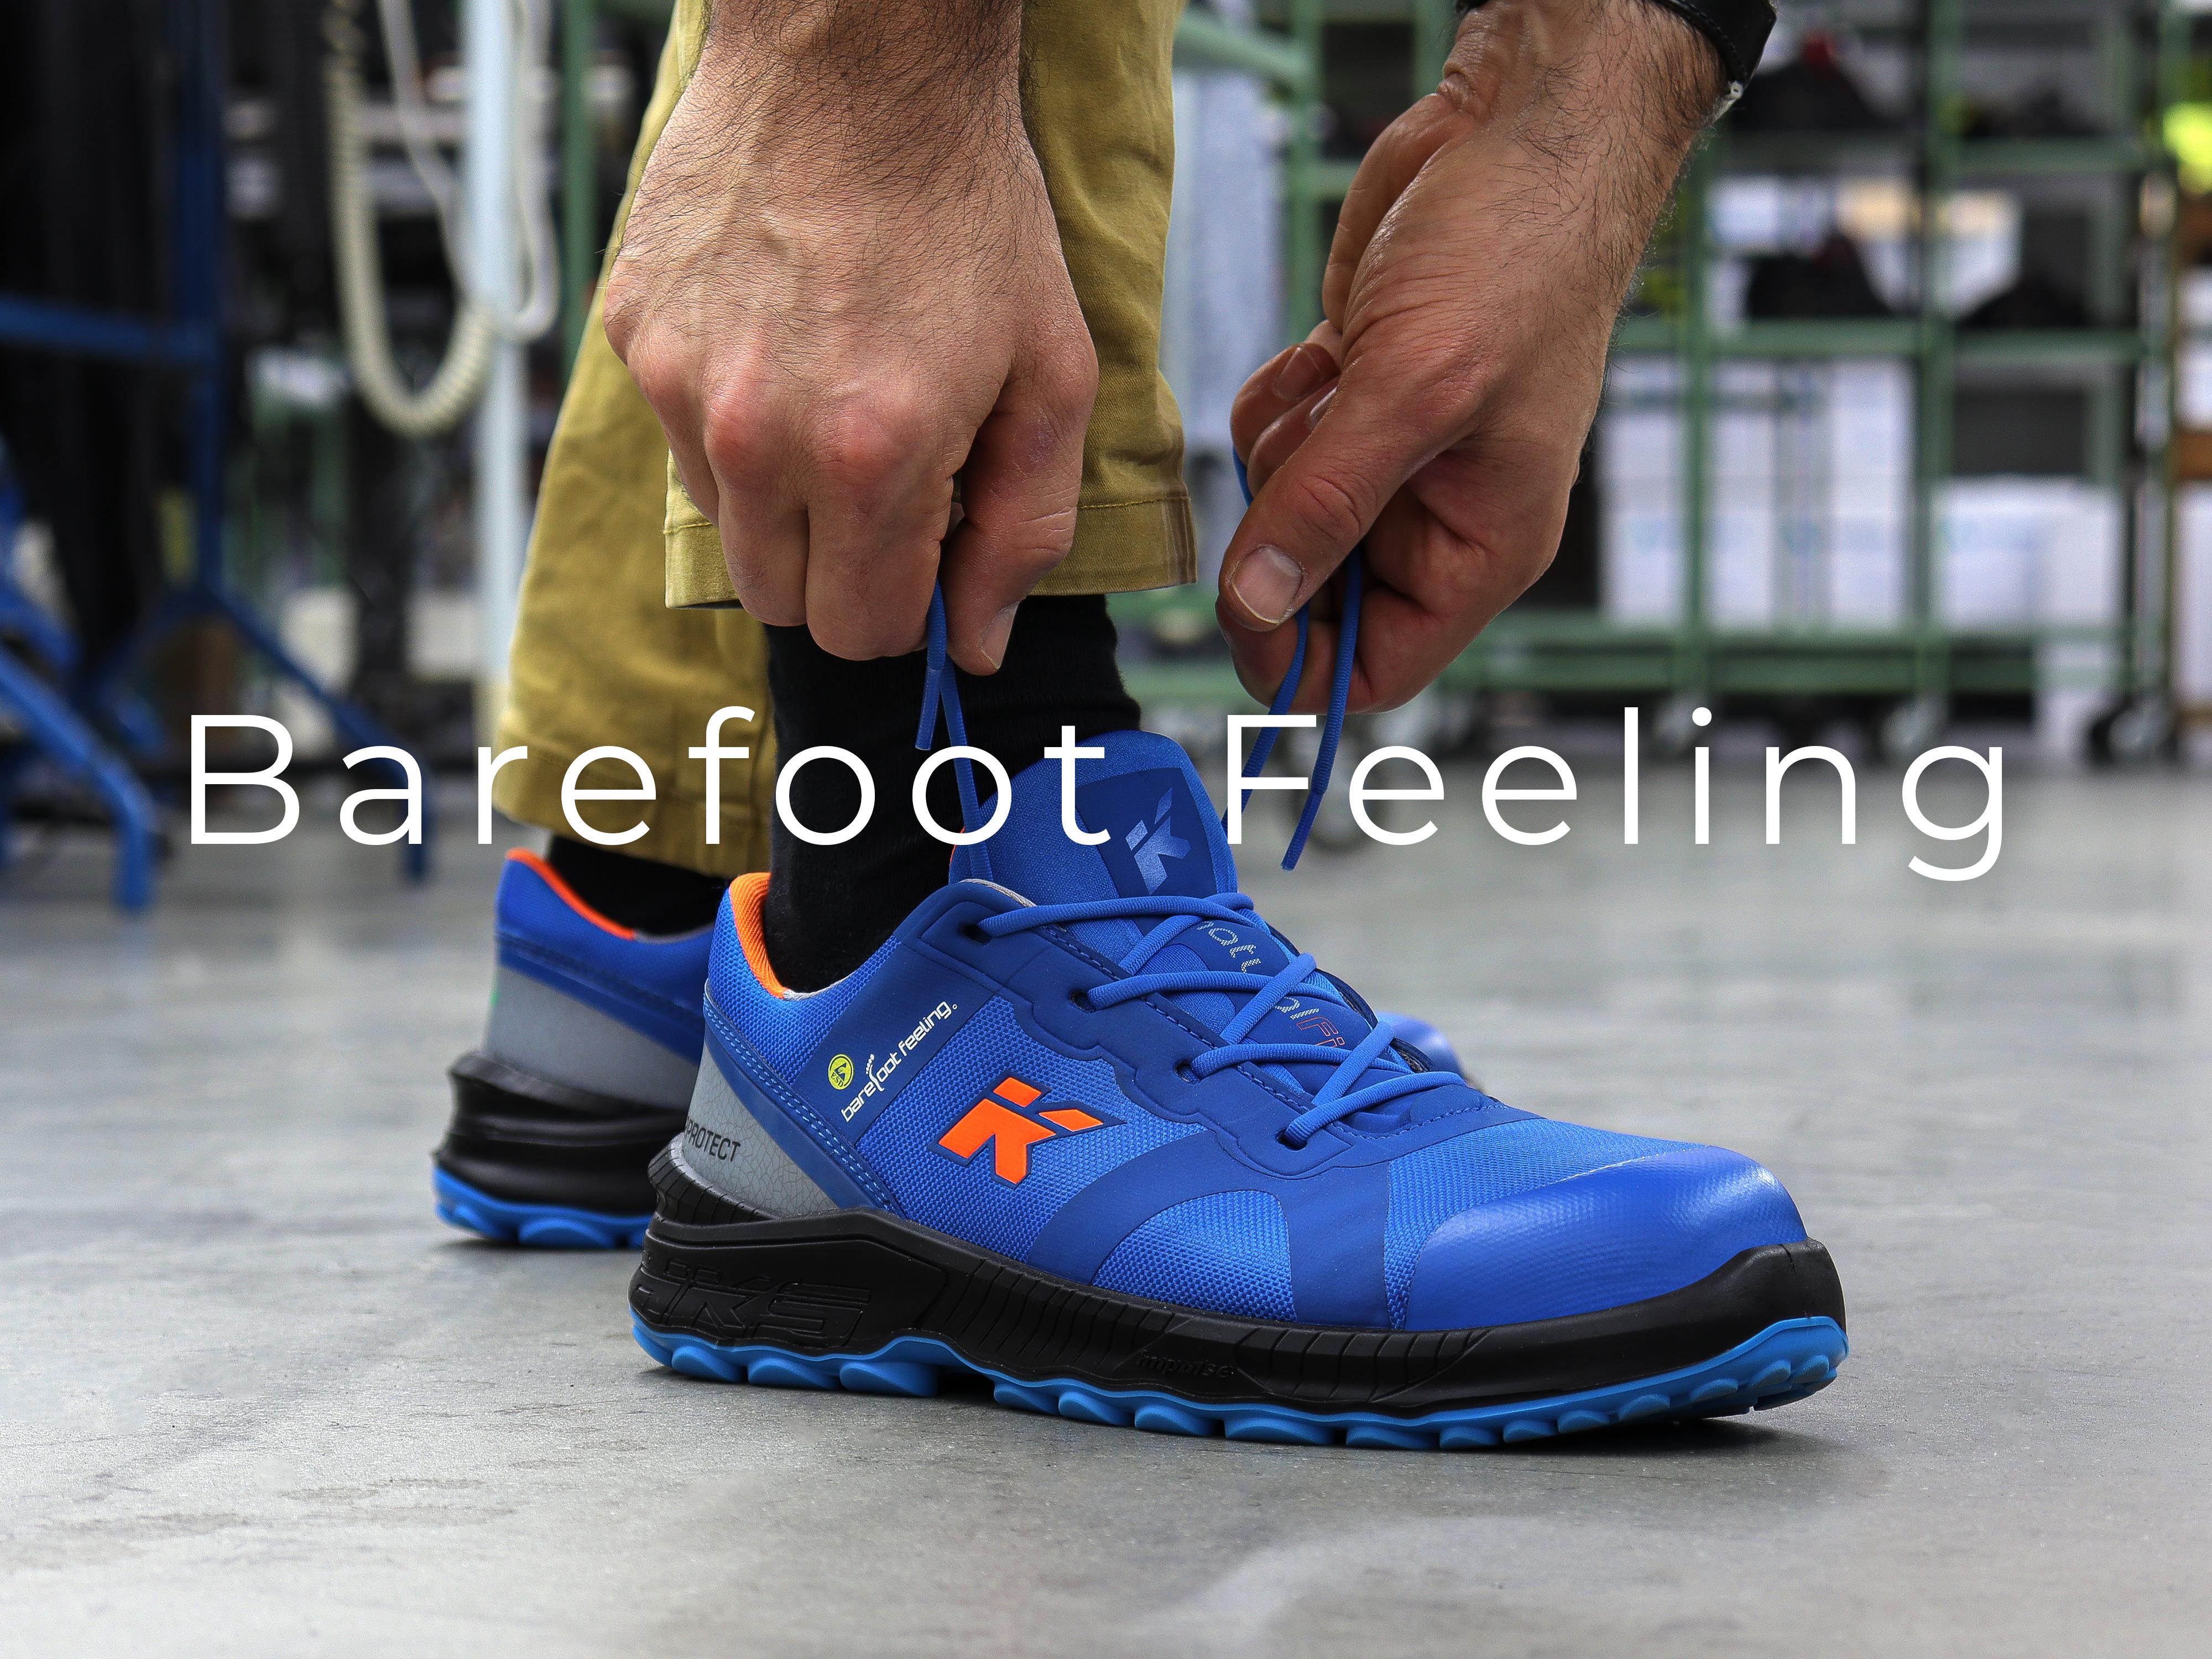 Barefoot Feeling